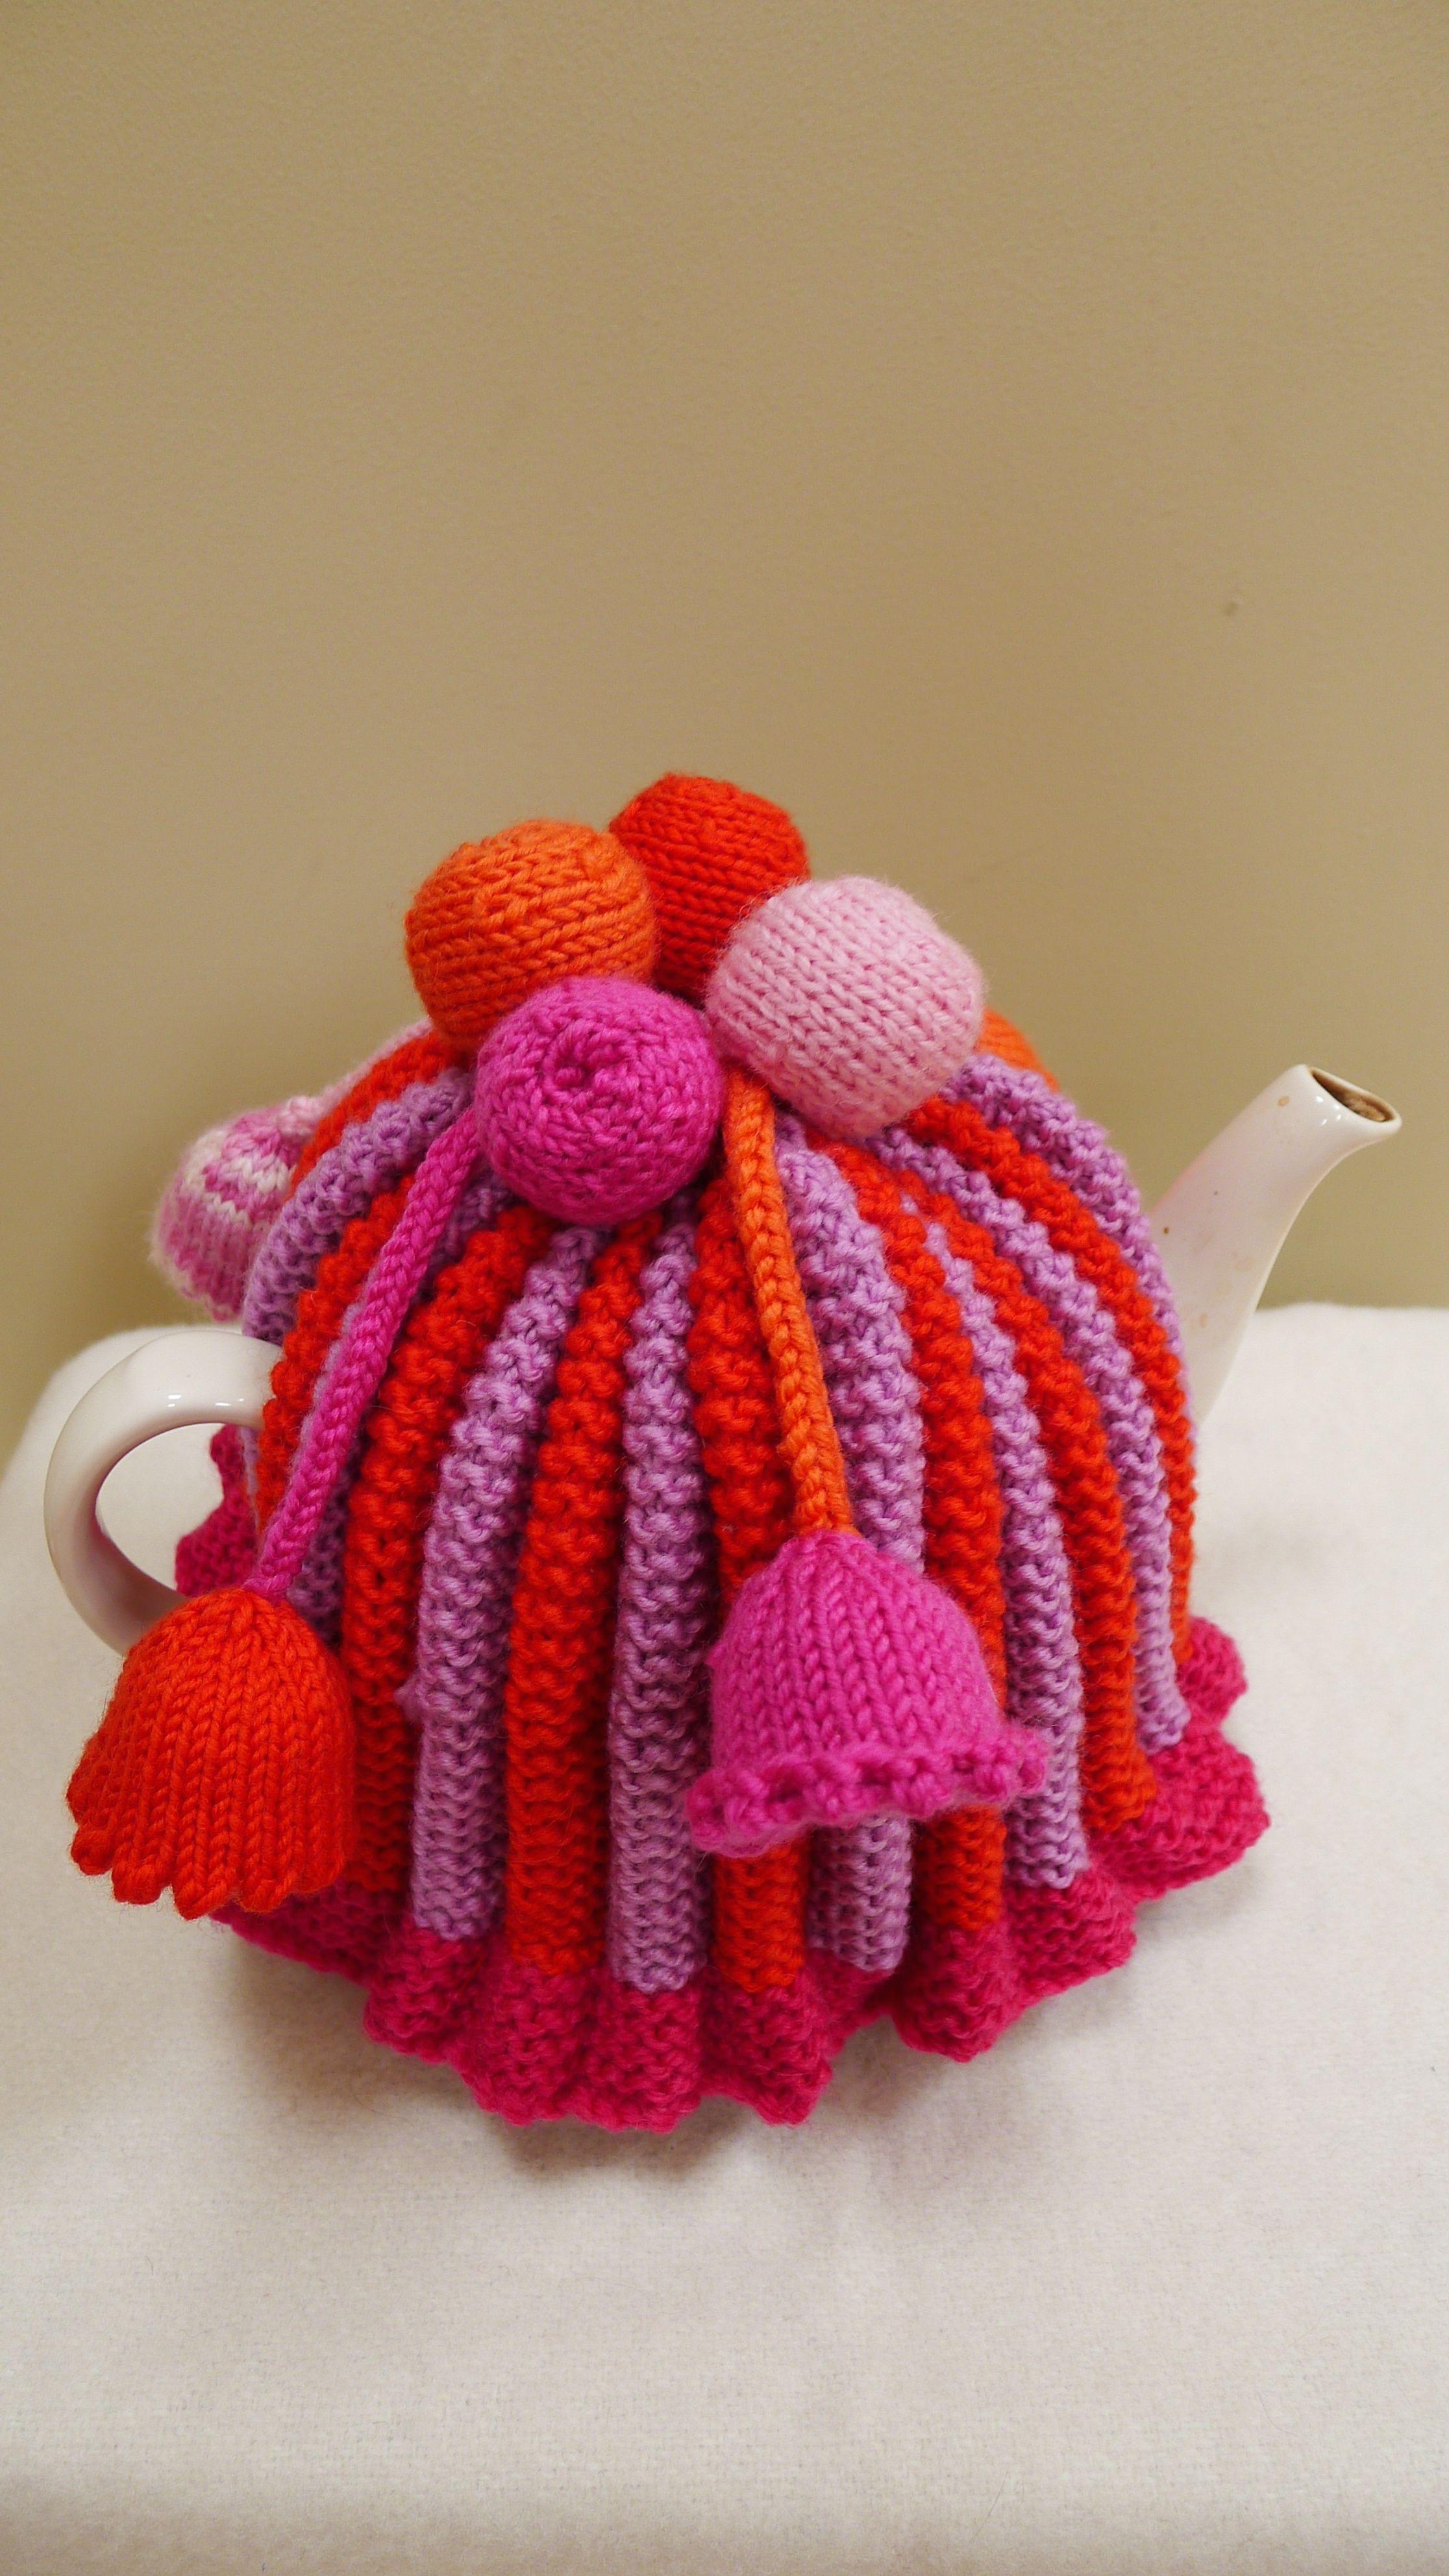 Retro Tea Cosy | Knitting | Pinterest